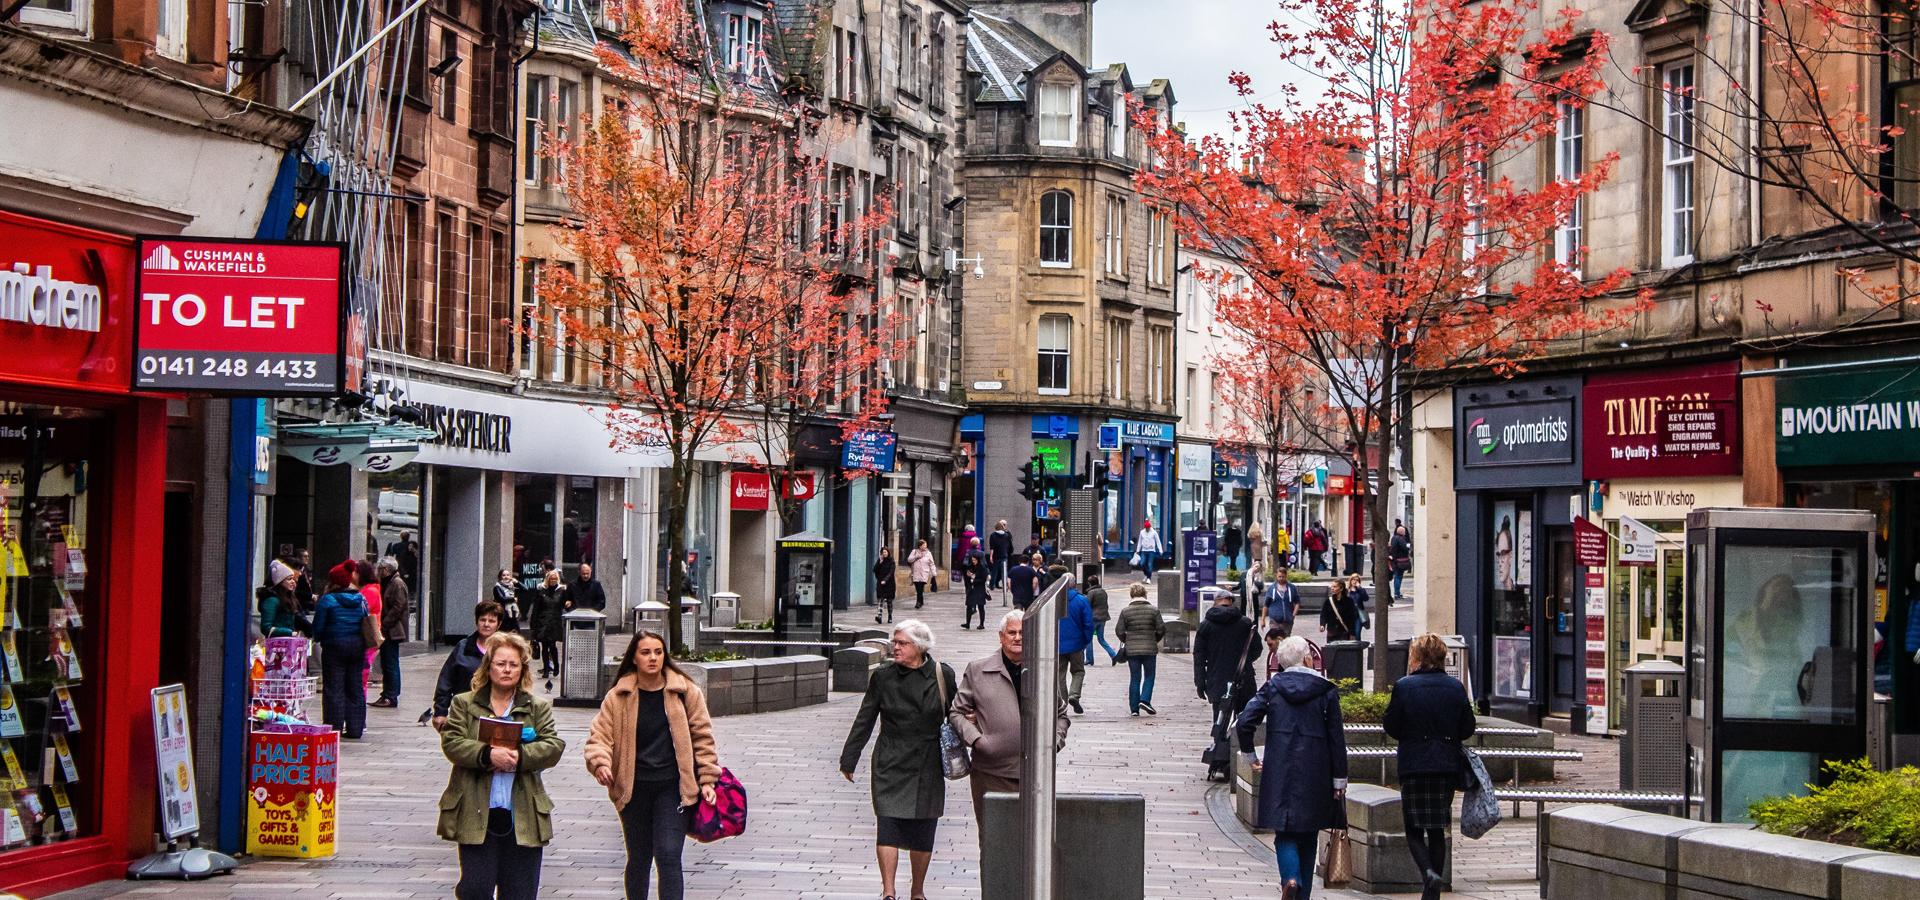 Peer-to-peer advisory in Stirling, Scotland, Great Britain